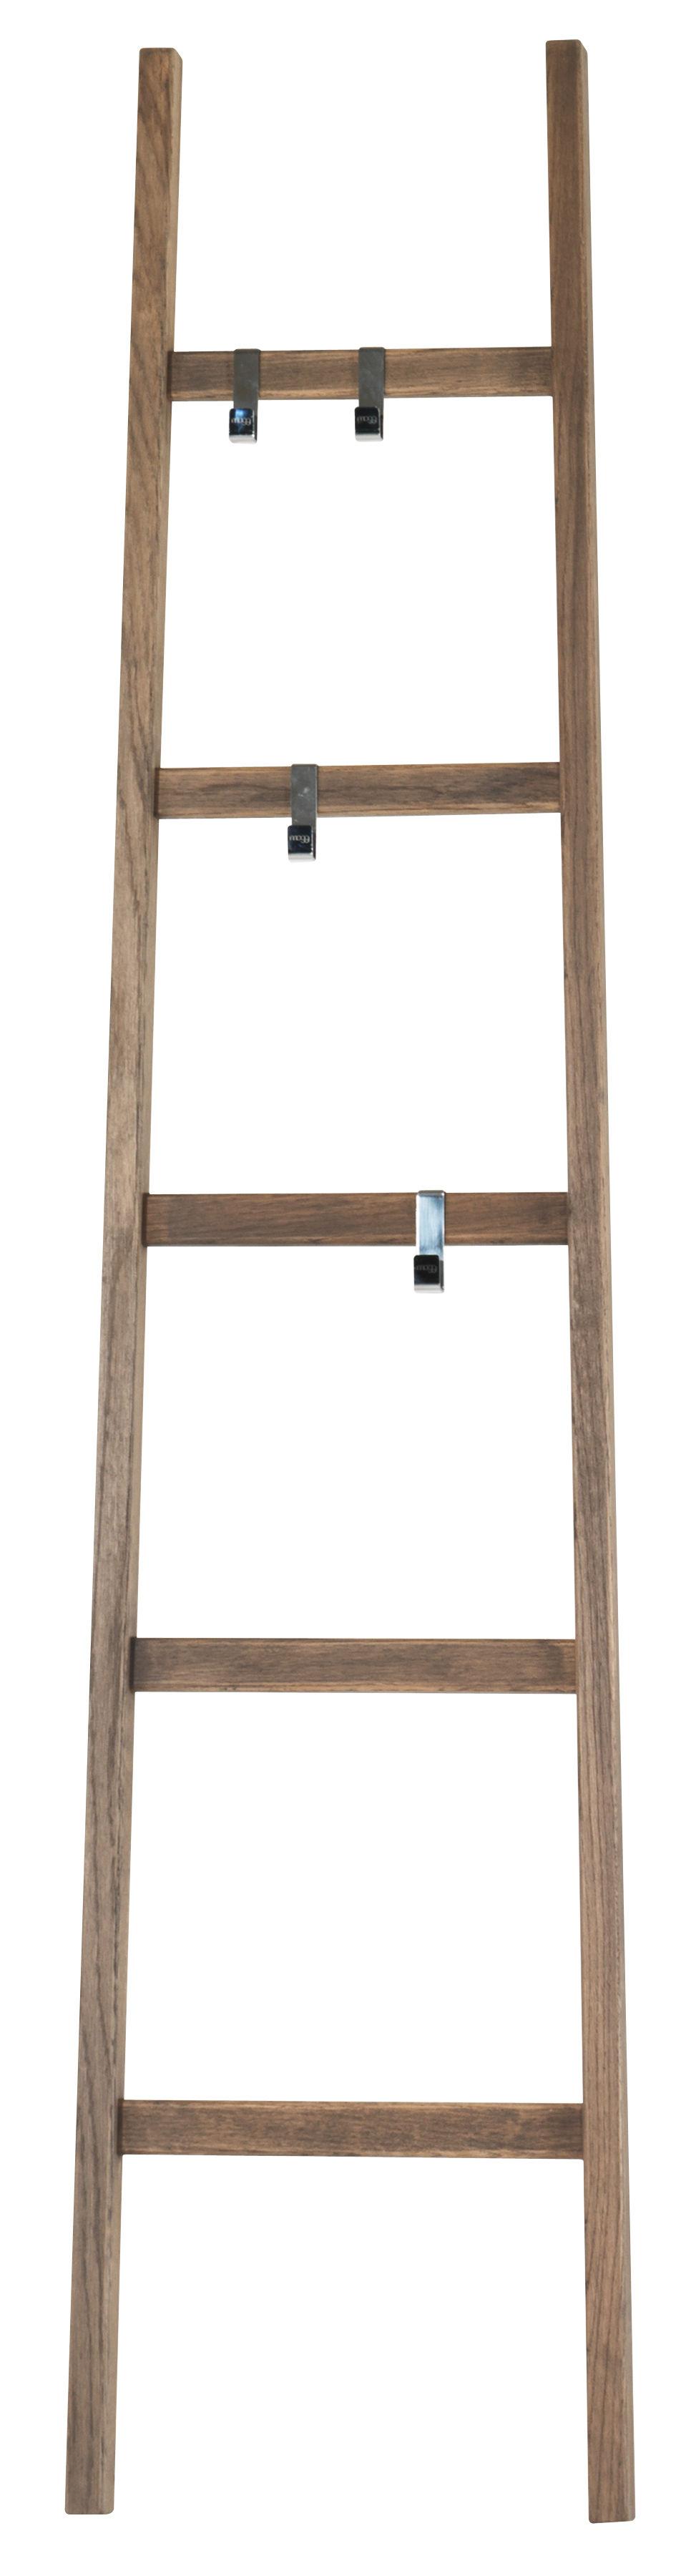 Furniture - Illuminated Furniture & Light UP Tables - Alla Scala Luminous coat rack - / LED included - H 190 cm by Mogg - Scale / Ash - Ashwood, Polished steel